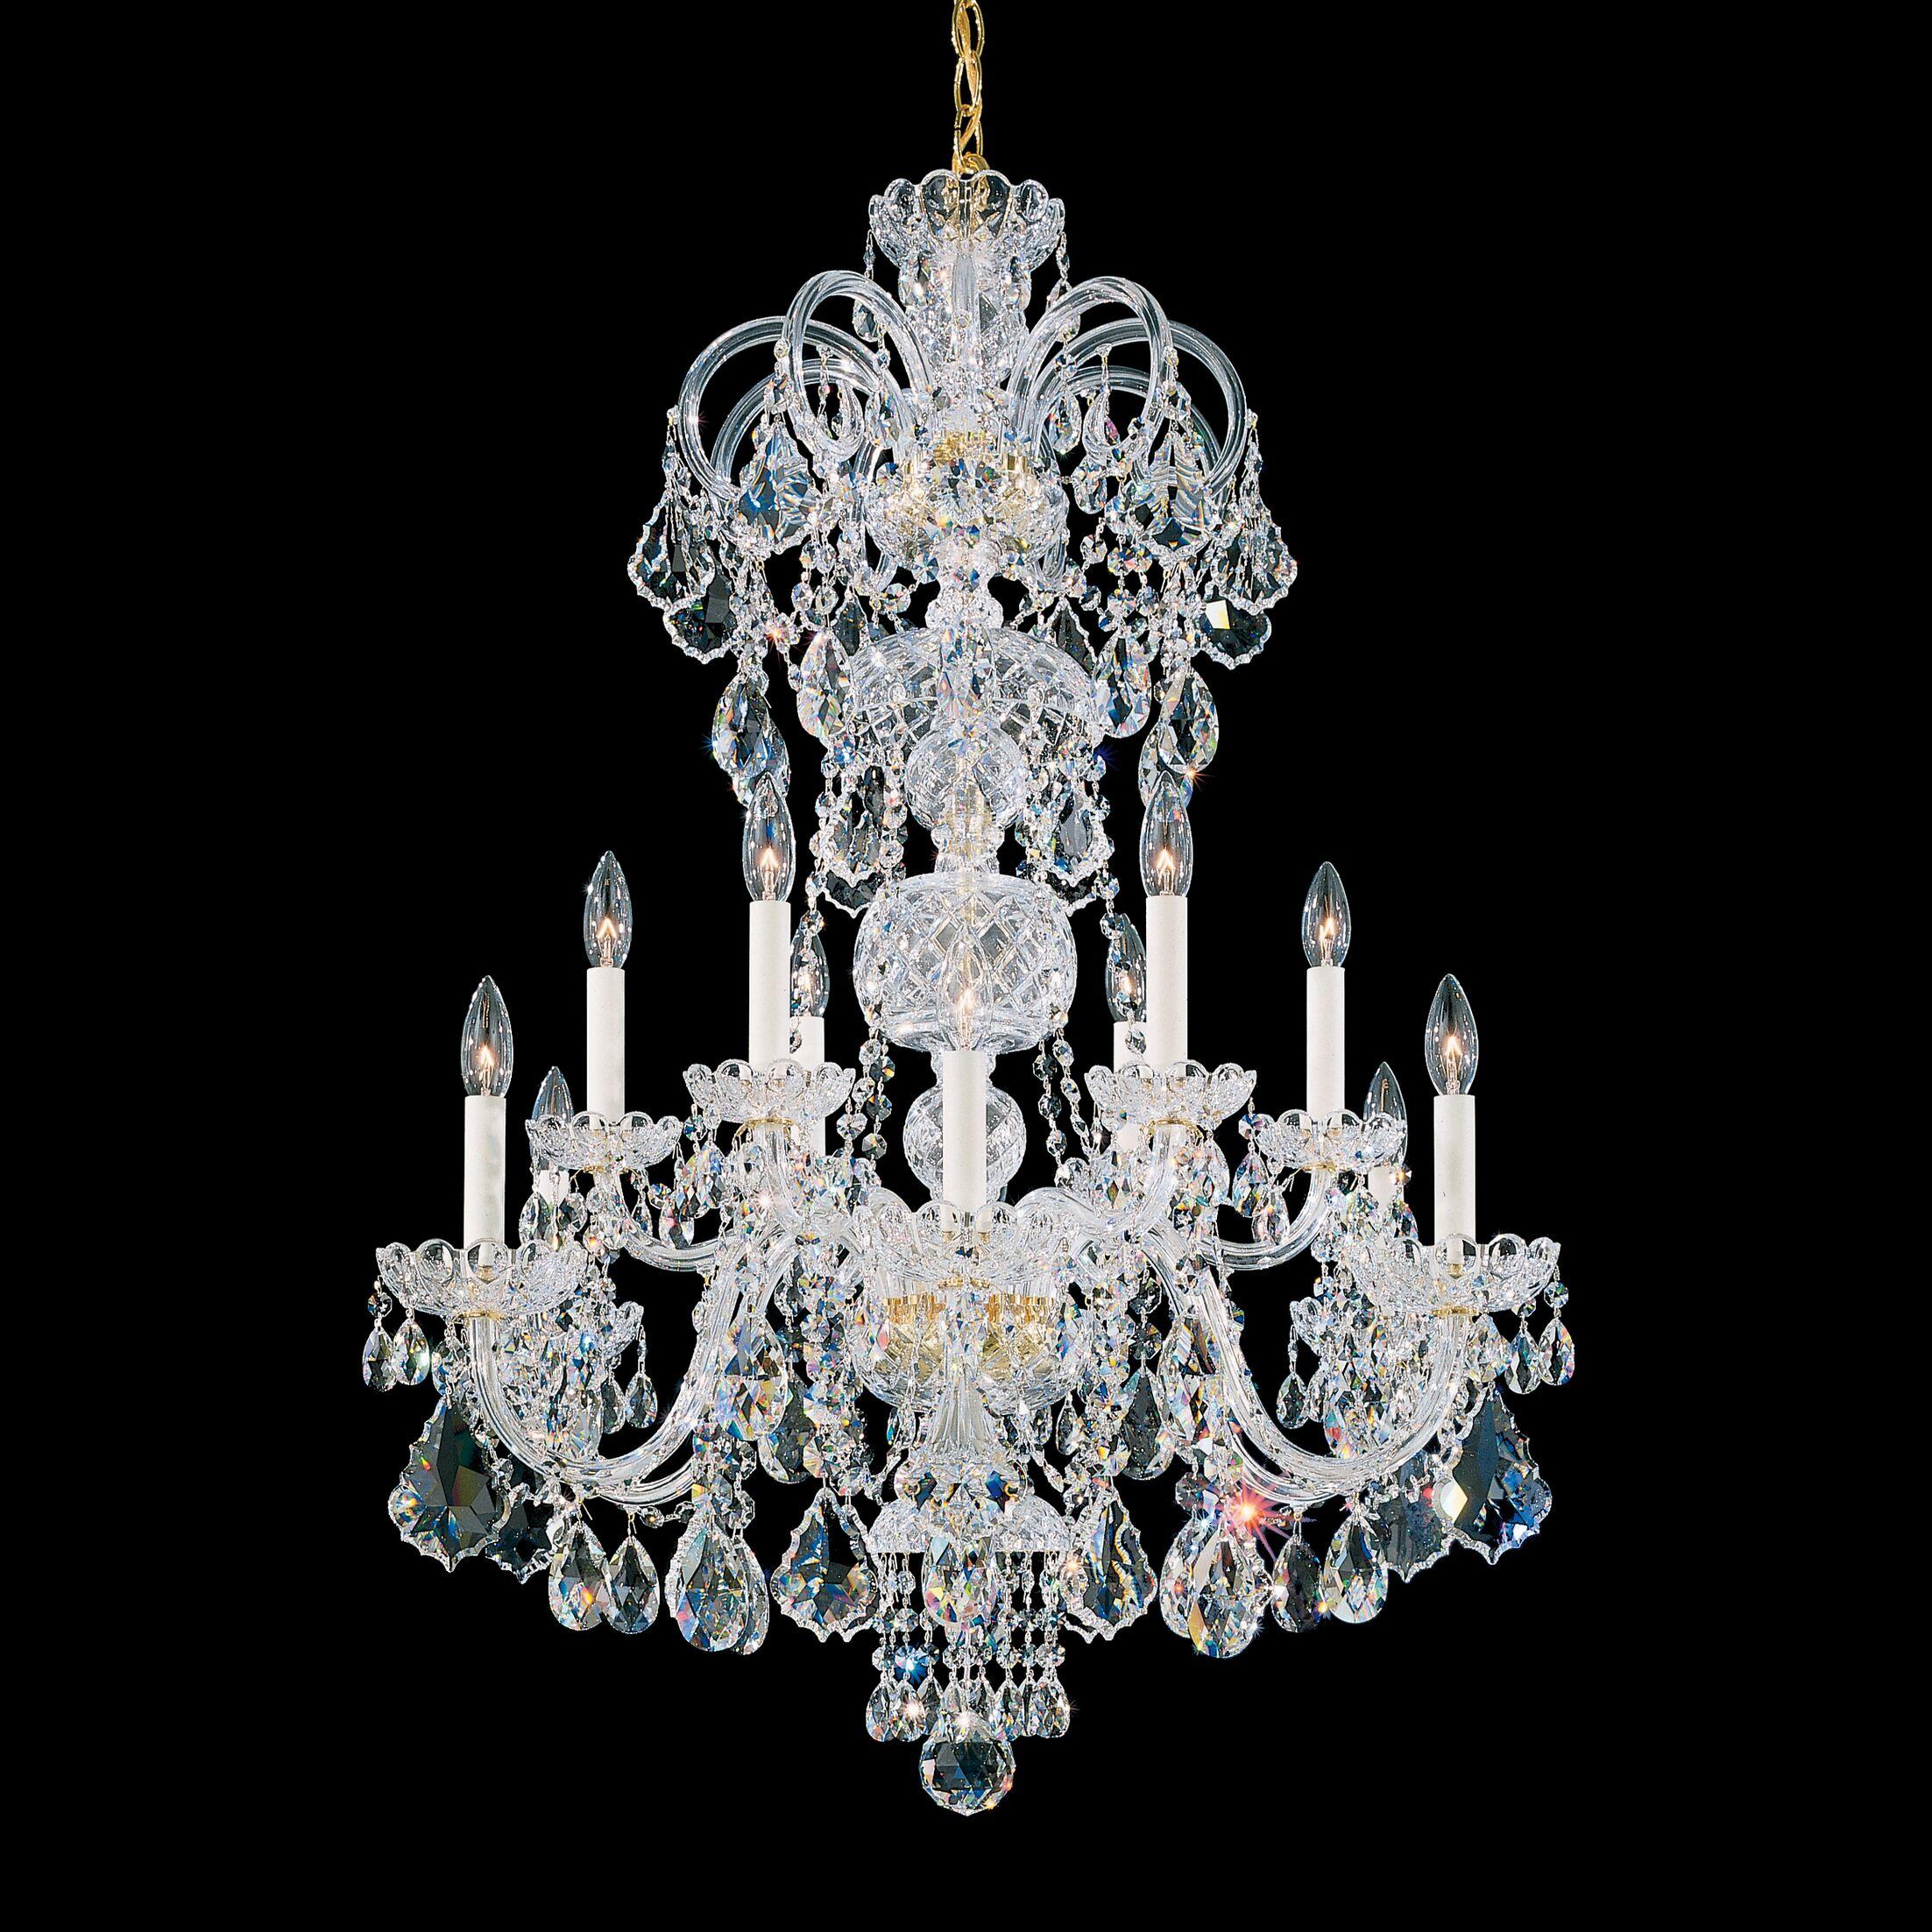 Olde World 12-Light Chandelier Finish: Aurelia, Crystal Color: Spectra Crystal Clear